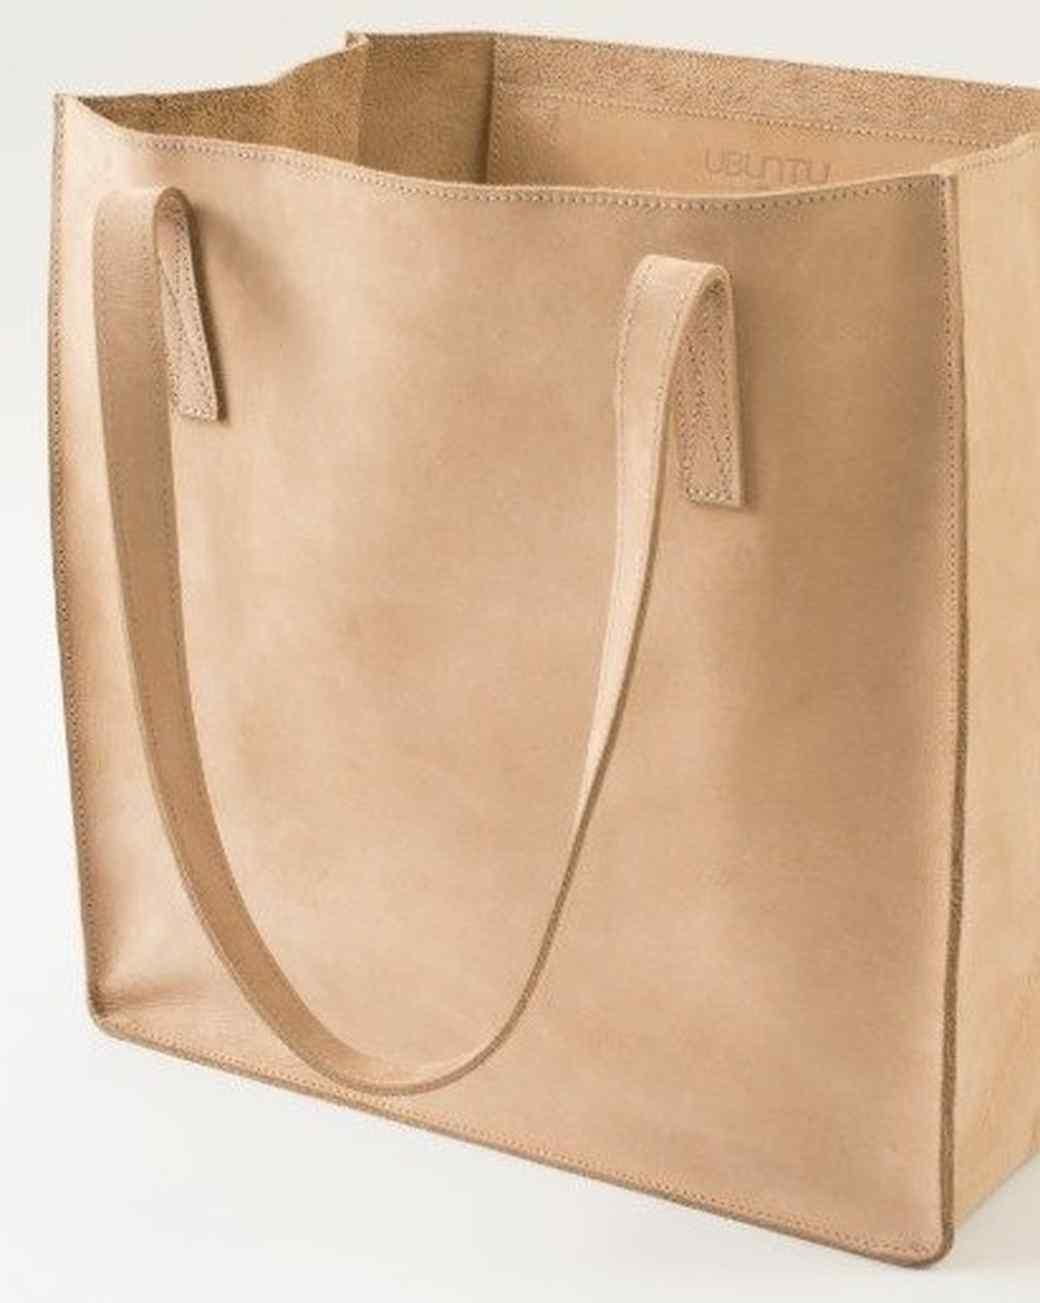 Zazzle-Ubuntu Made Leather Tote Bag